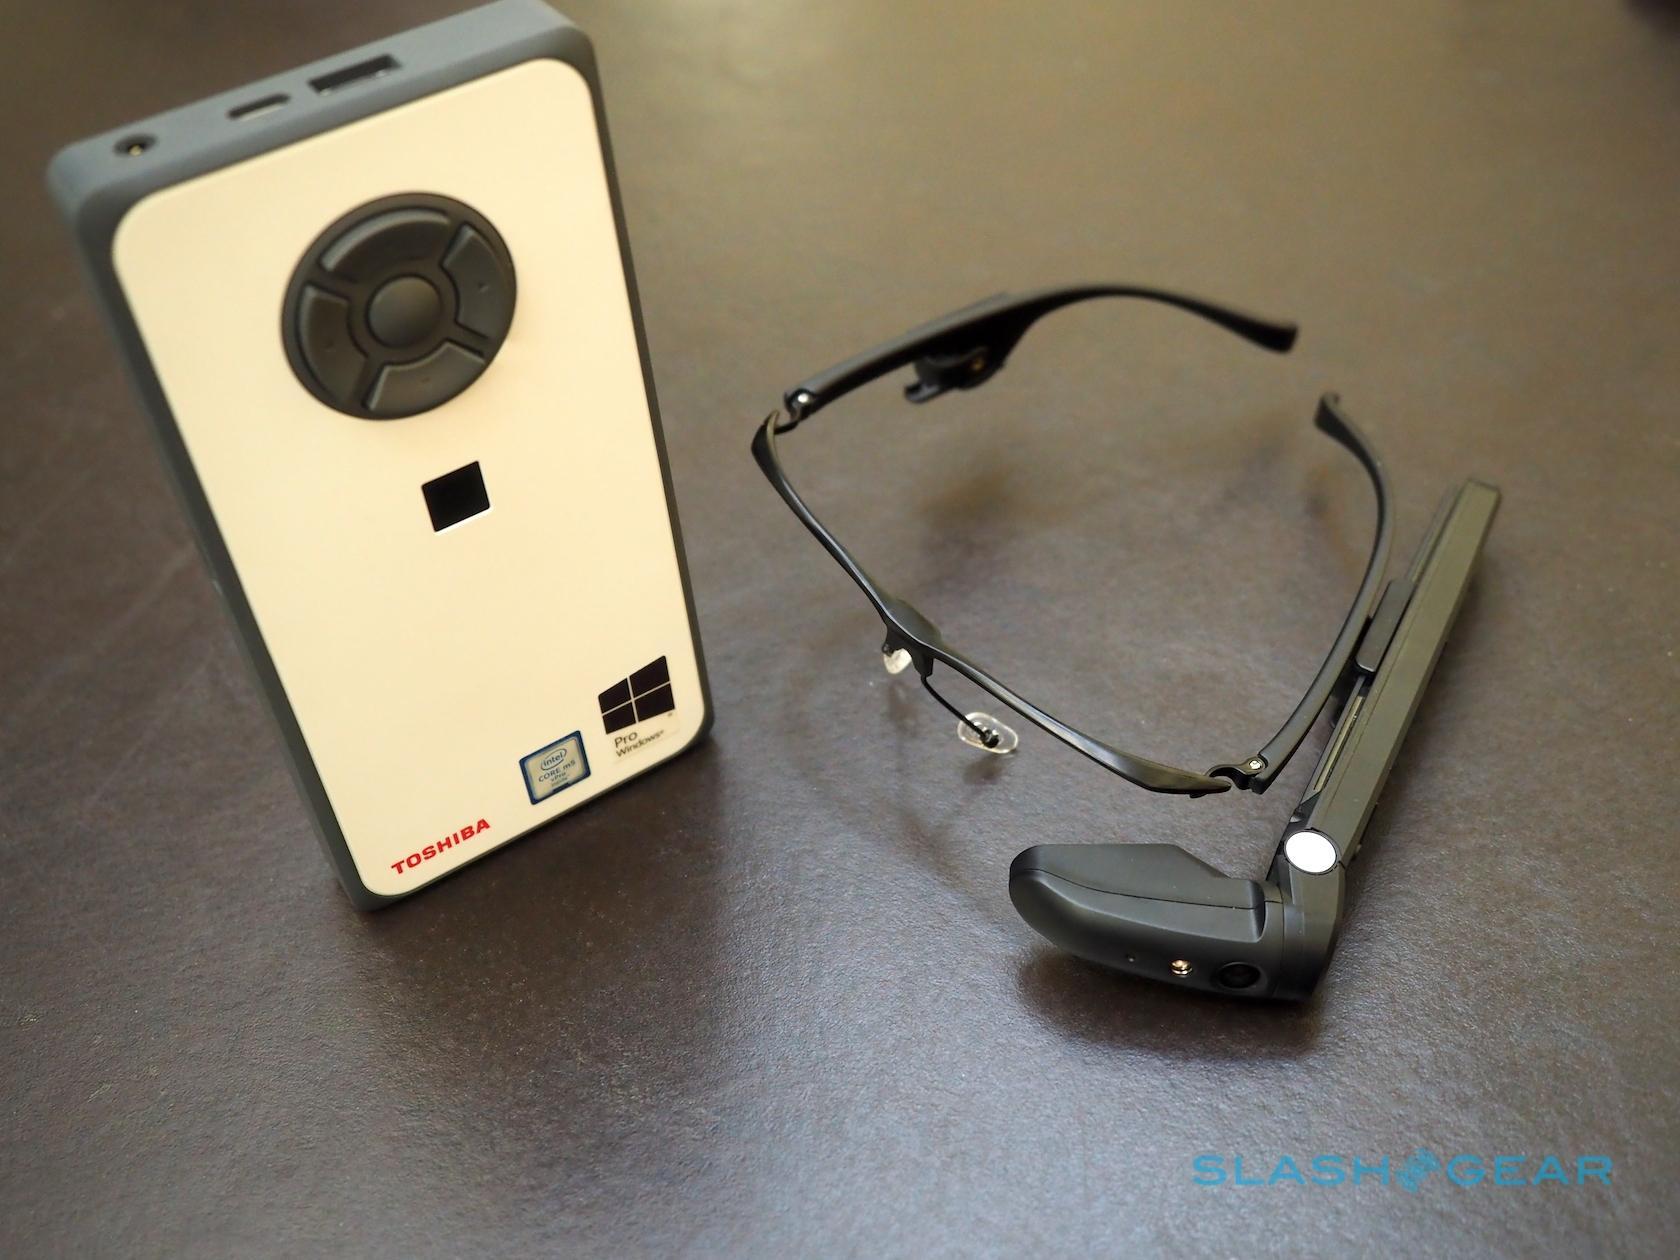 Toshiba's dynaEdge AR Smart Glasses make Win 10 wearable - SlashGear